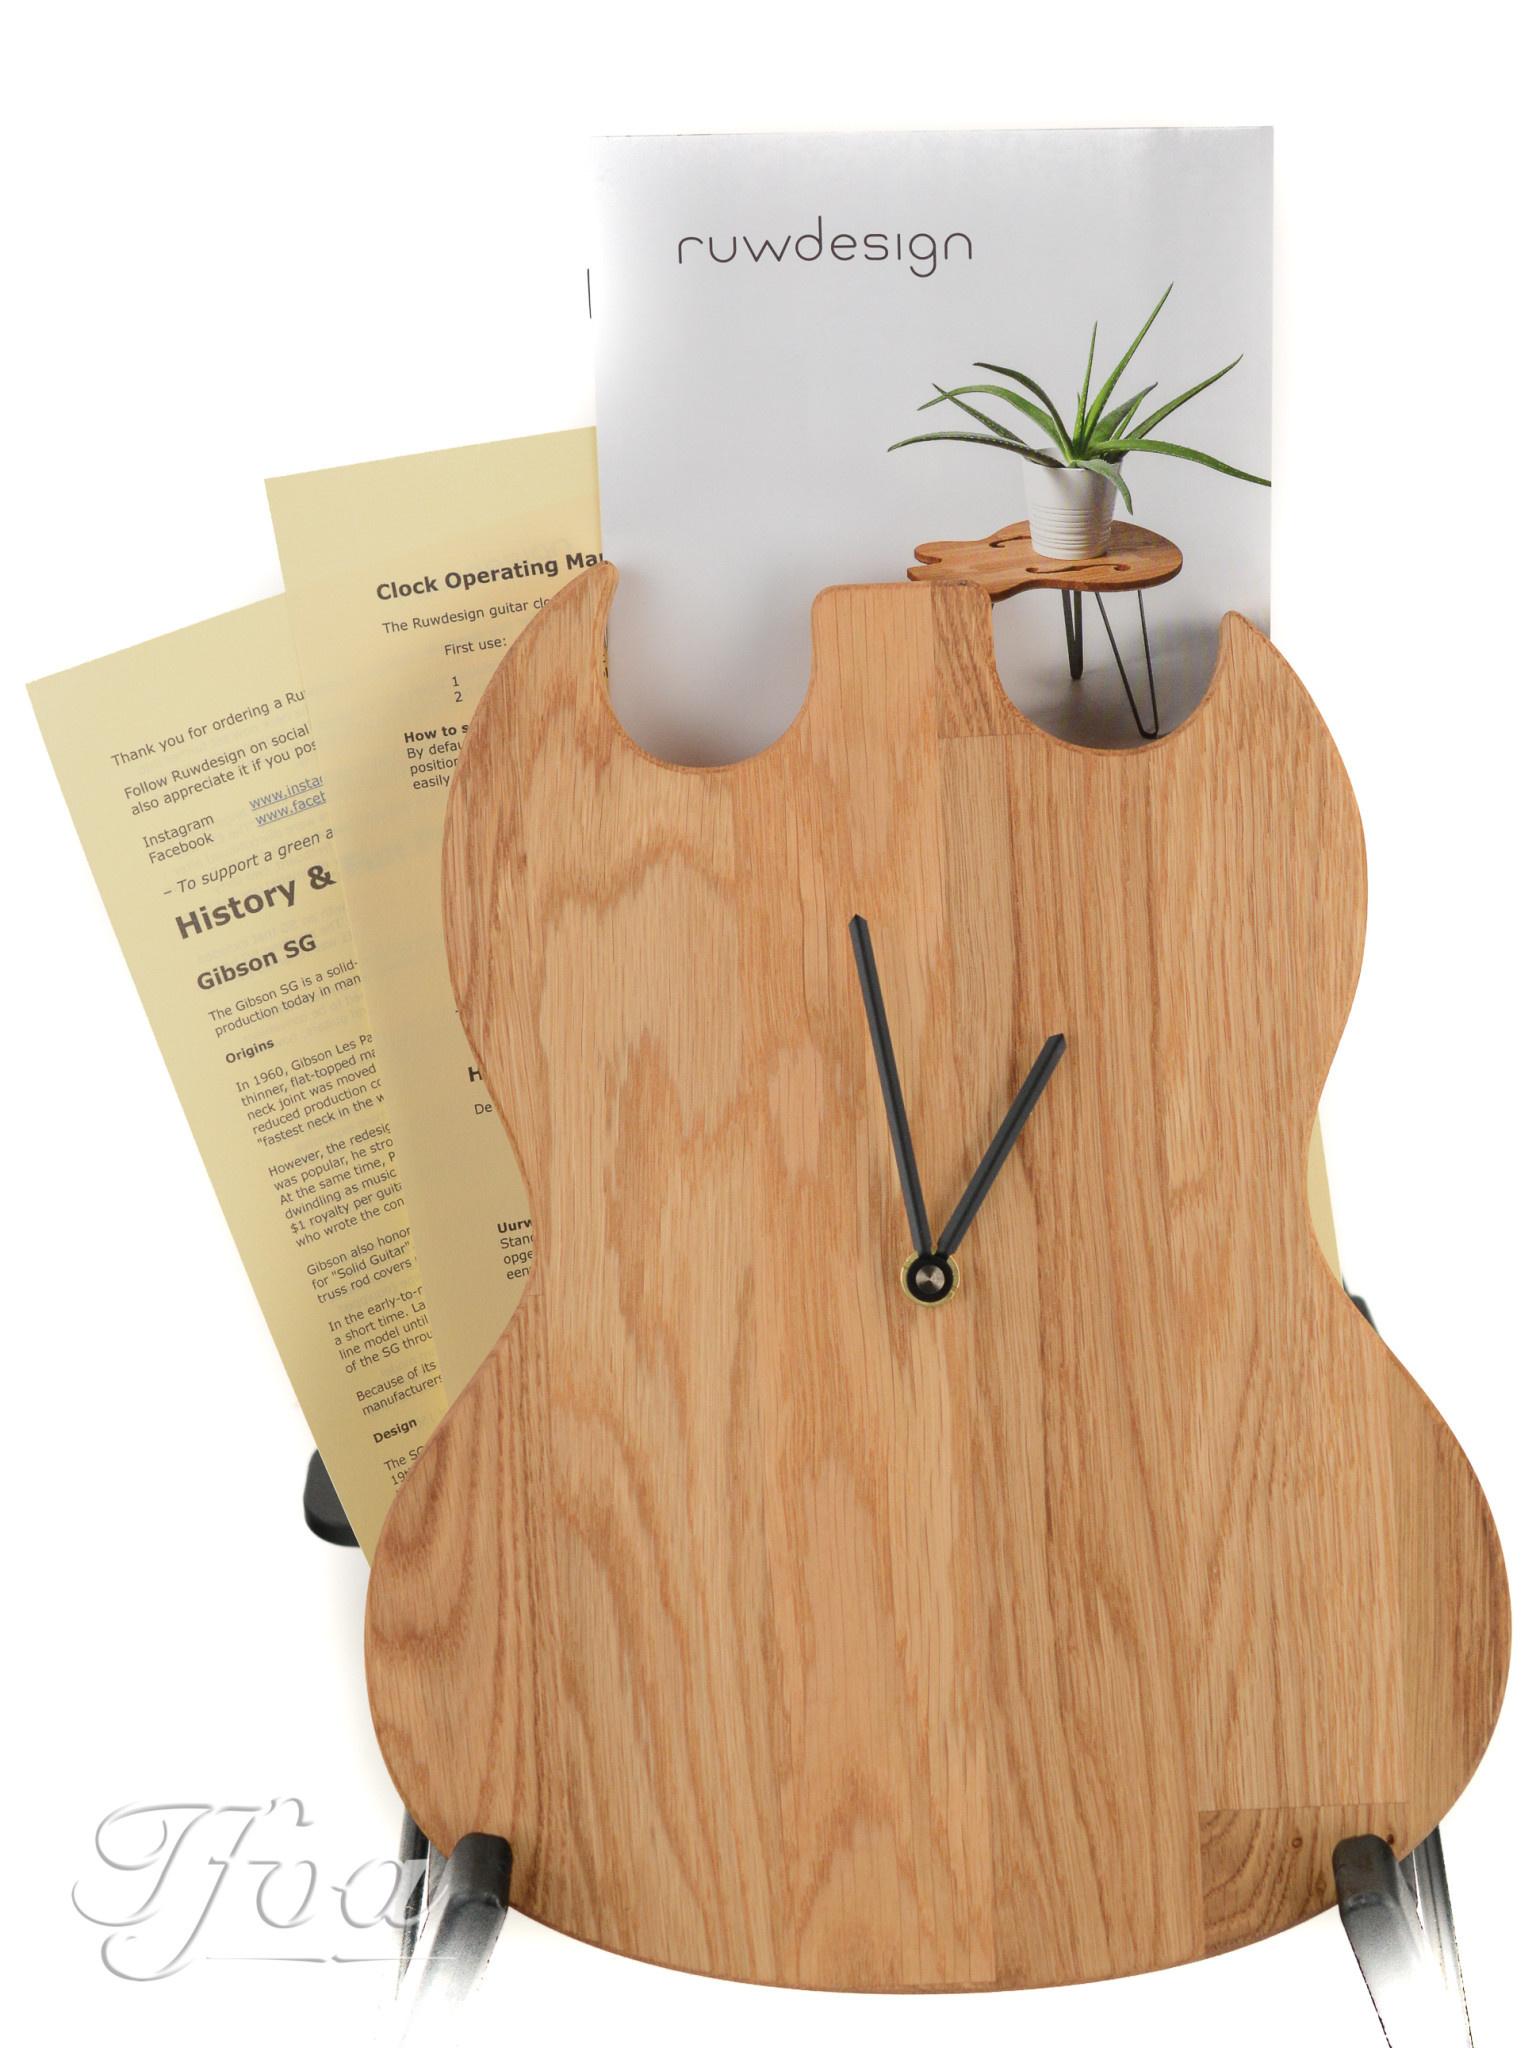 Ruwdesign Guitar Clock Double Cut